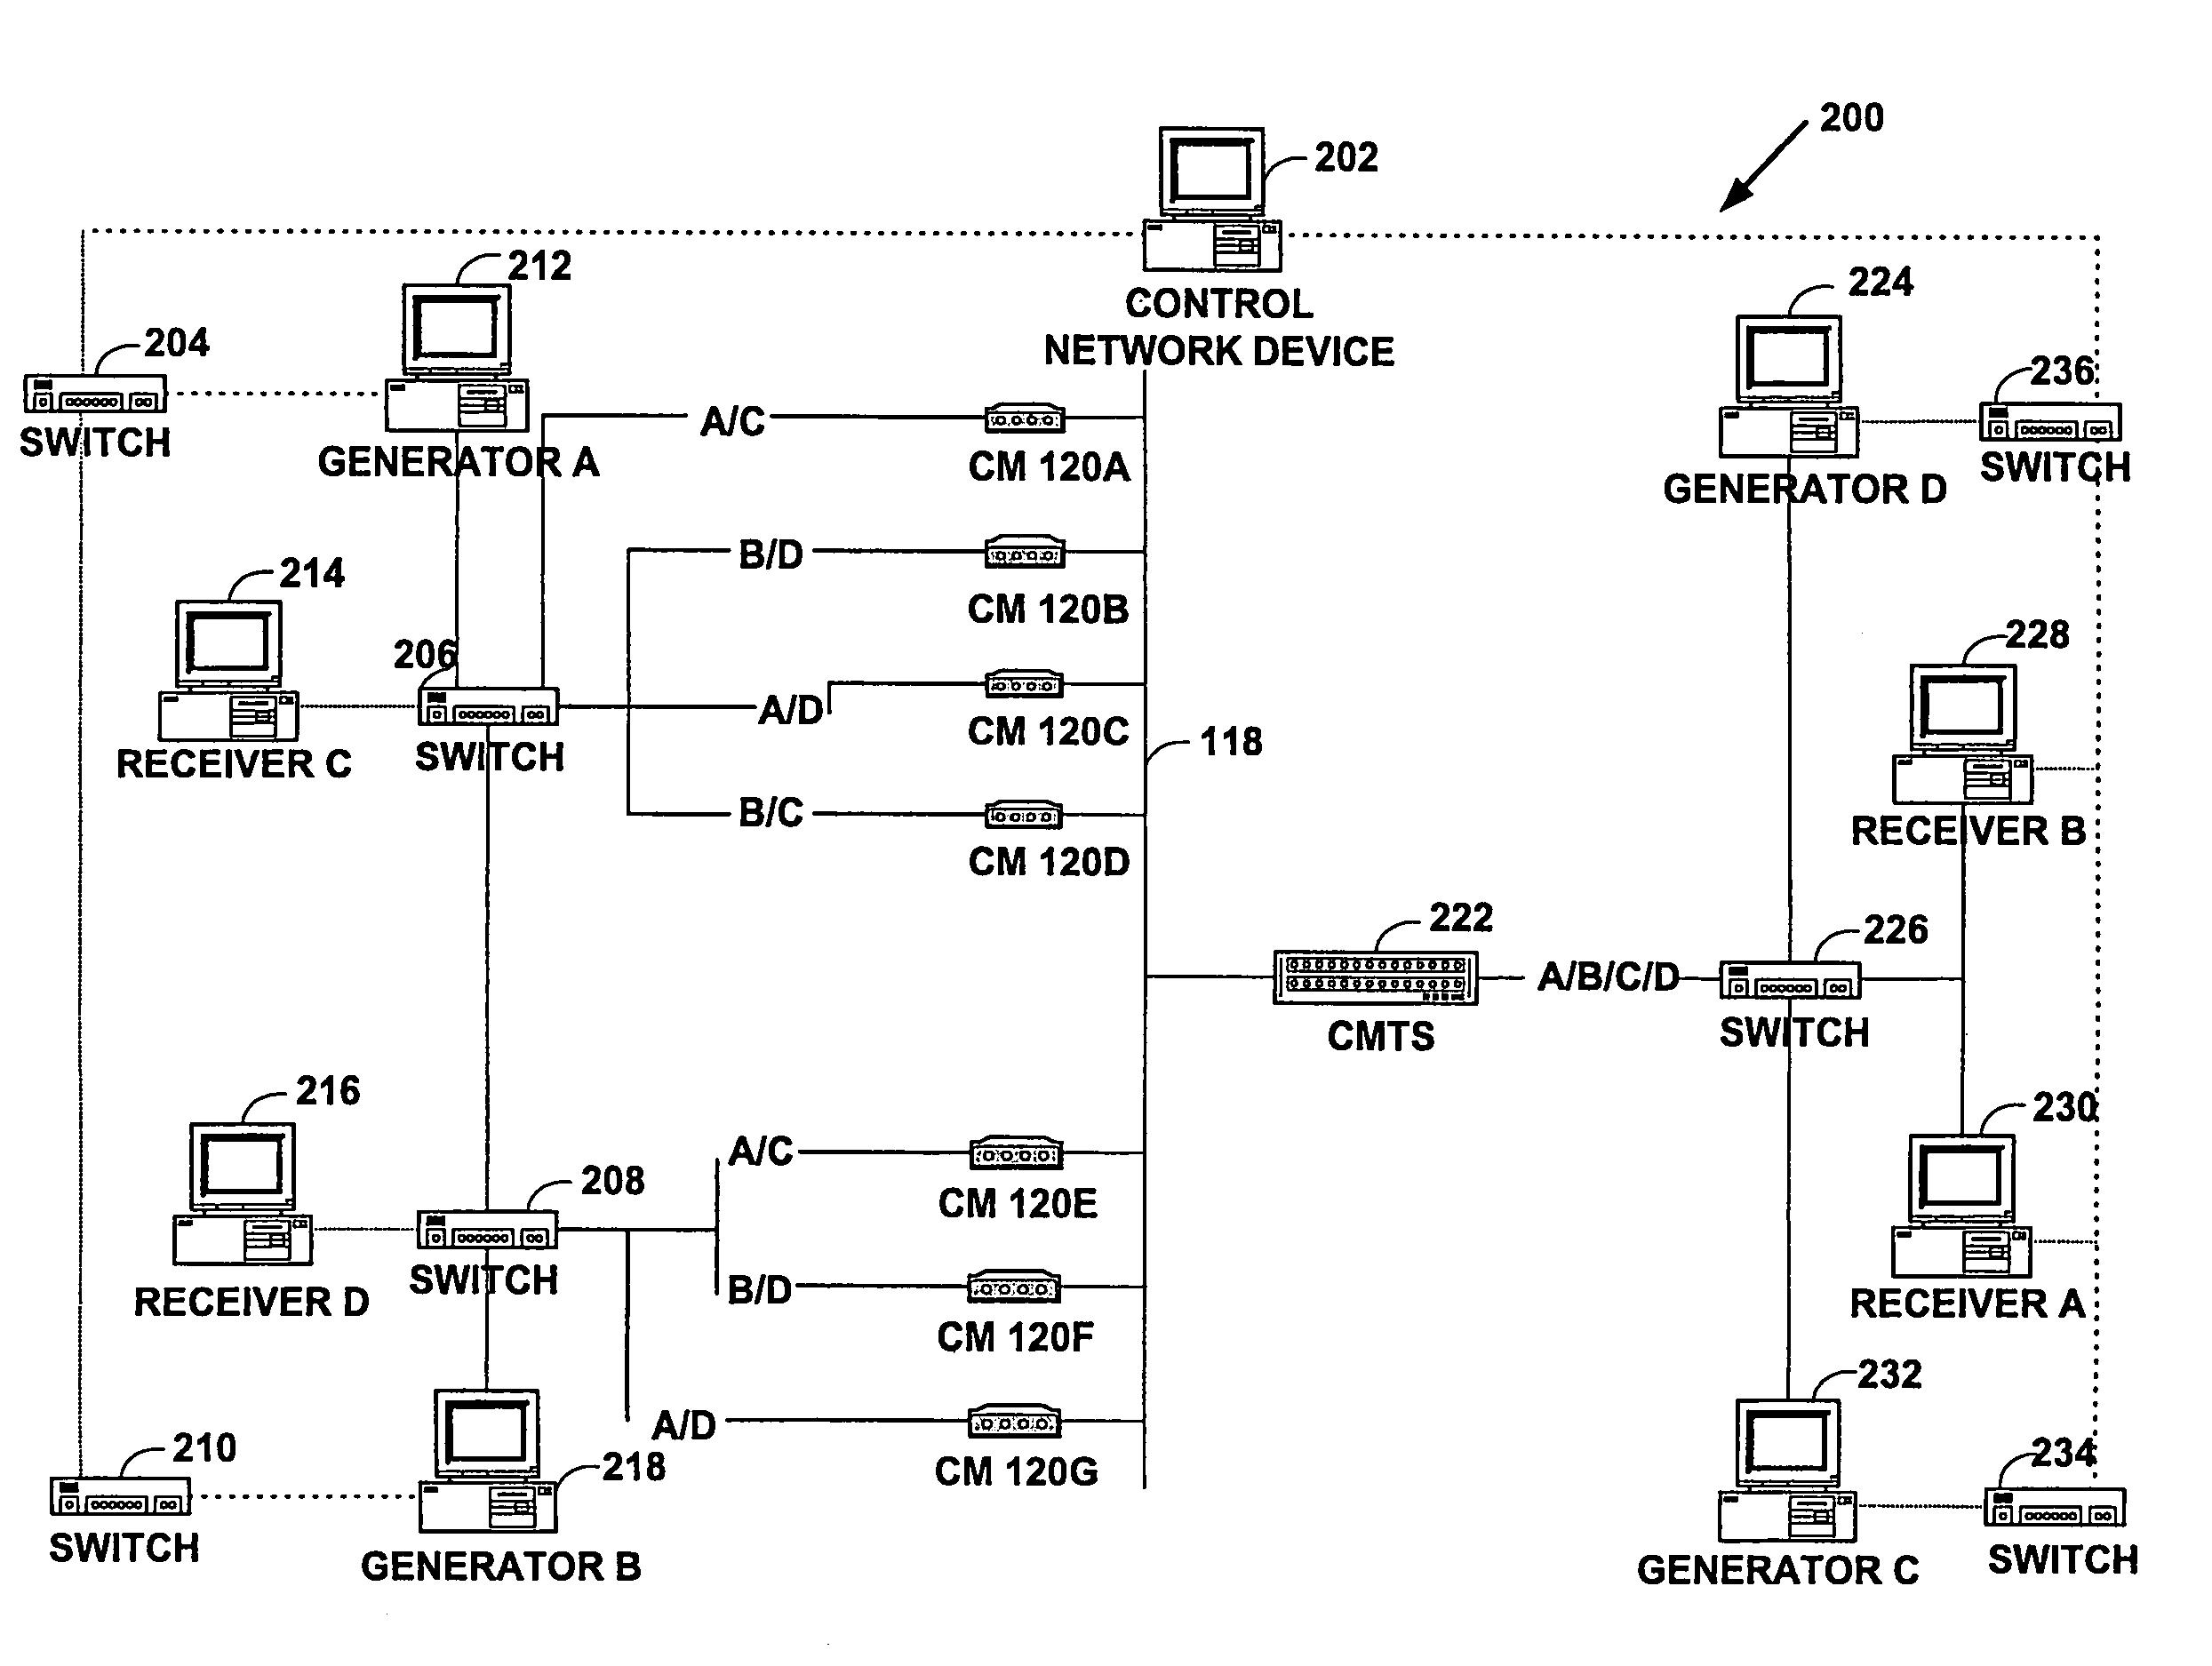 patent us 7 222 255 b1 Distribution Network Diagram first claim